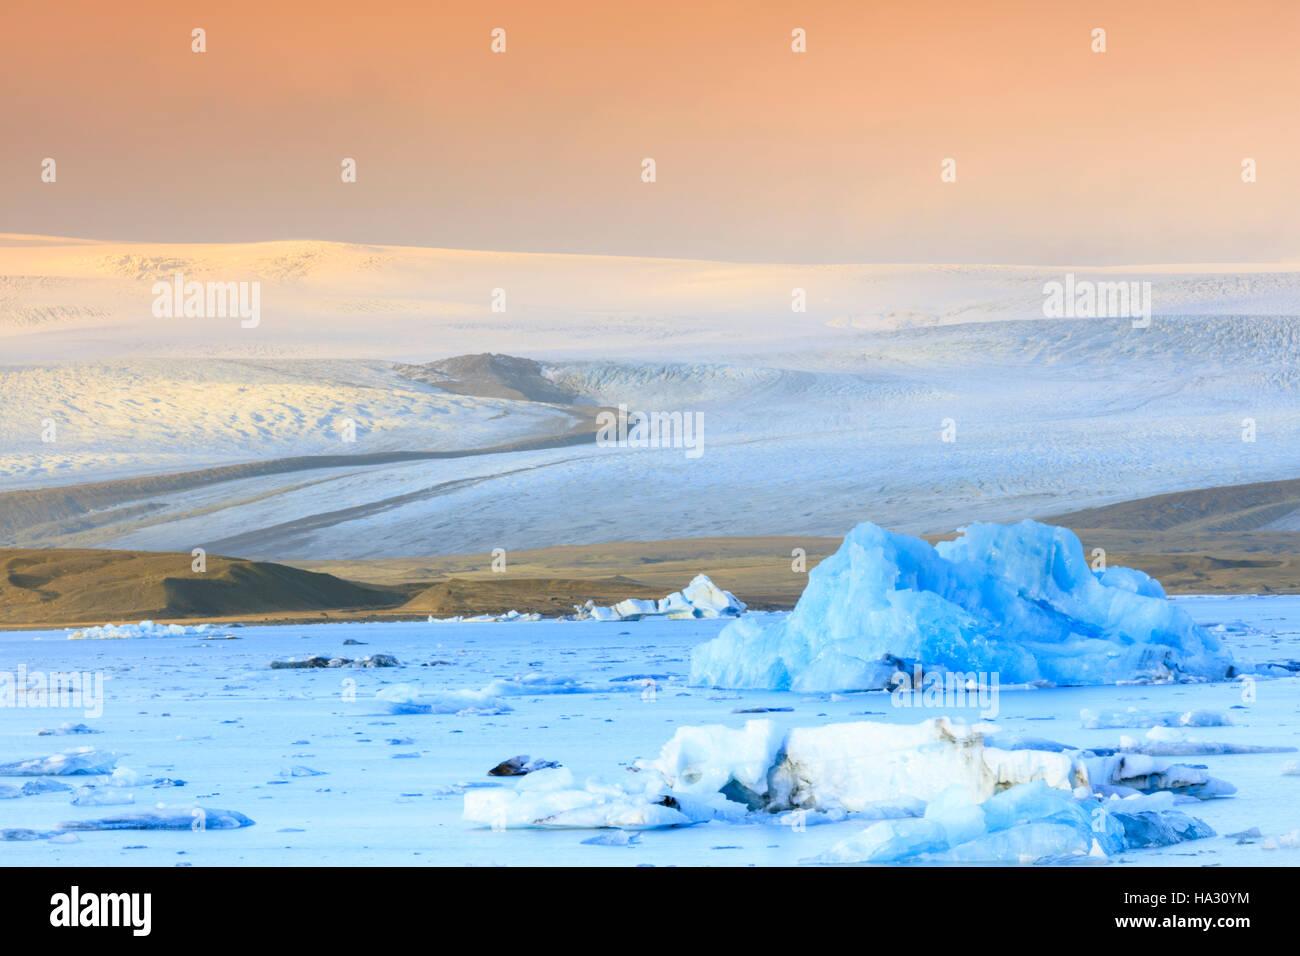 Jokulsarlon Glacier Lagoon - Floating Icebergs and glacier flowing off the ice sheet - Stock Image